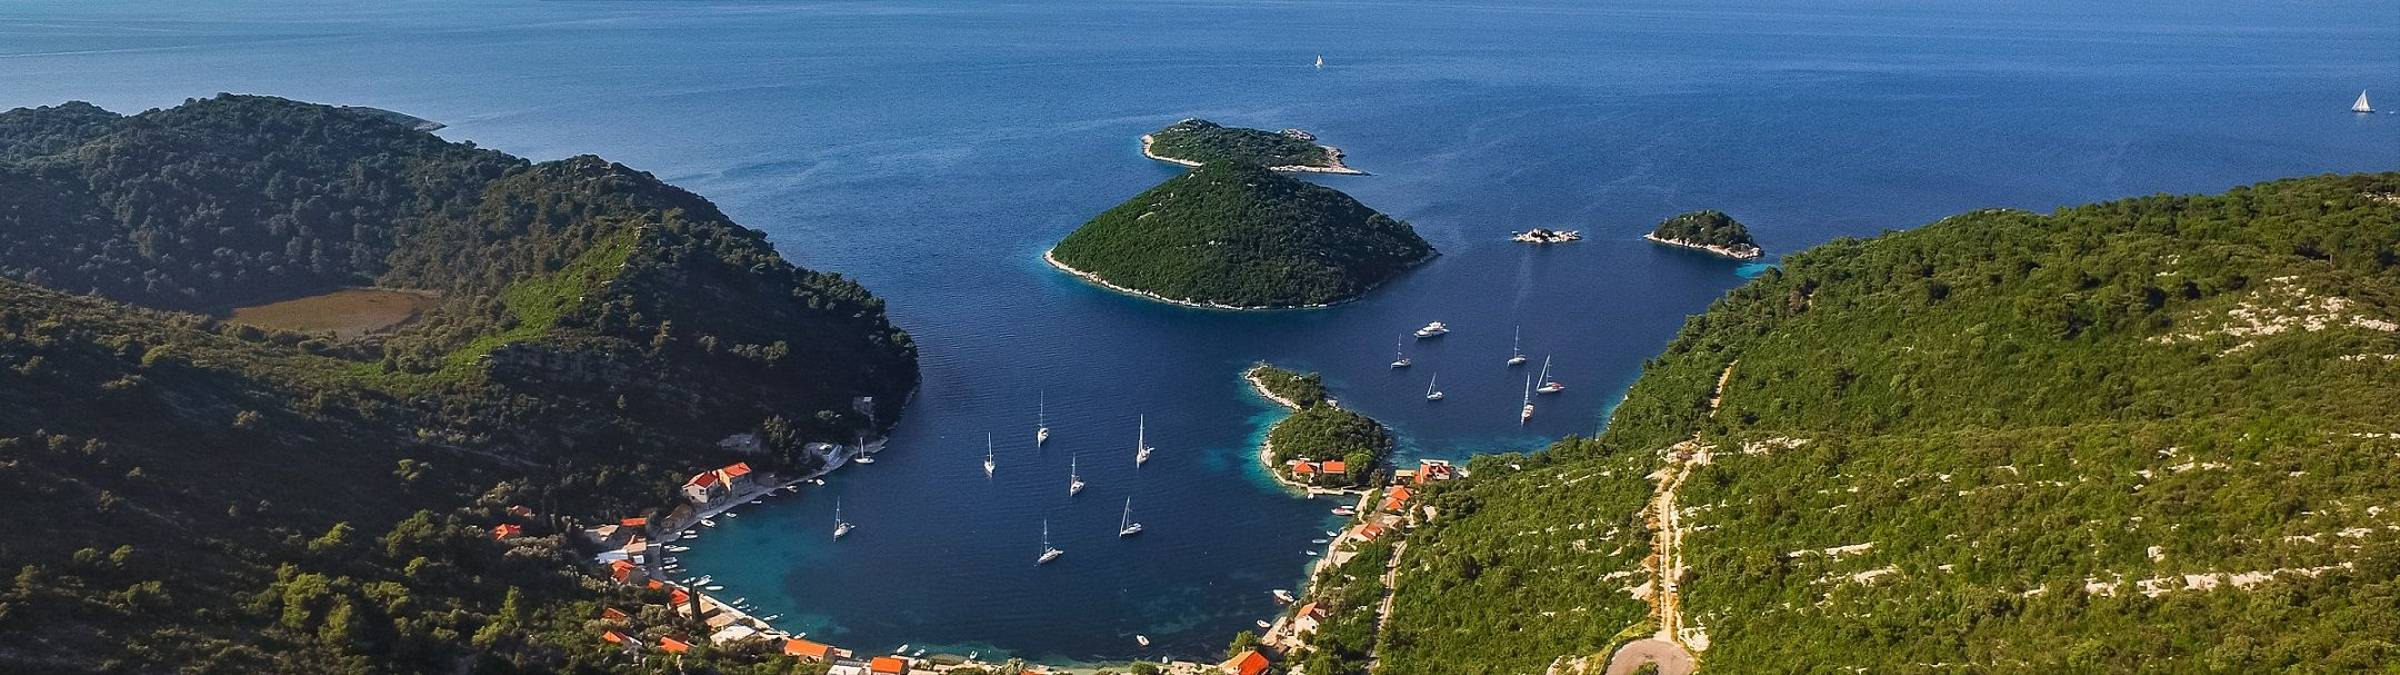 Mijet Credit Ivo Biocina/Croatian National Tourist Board